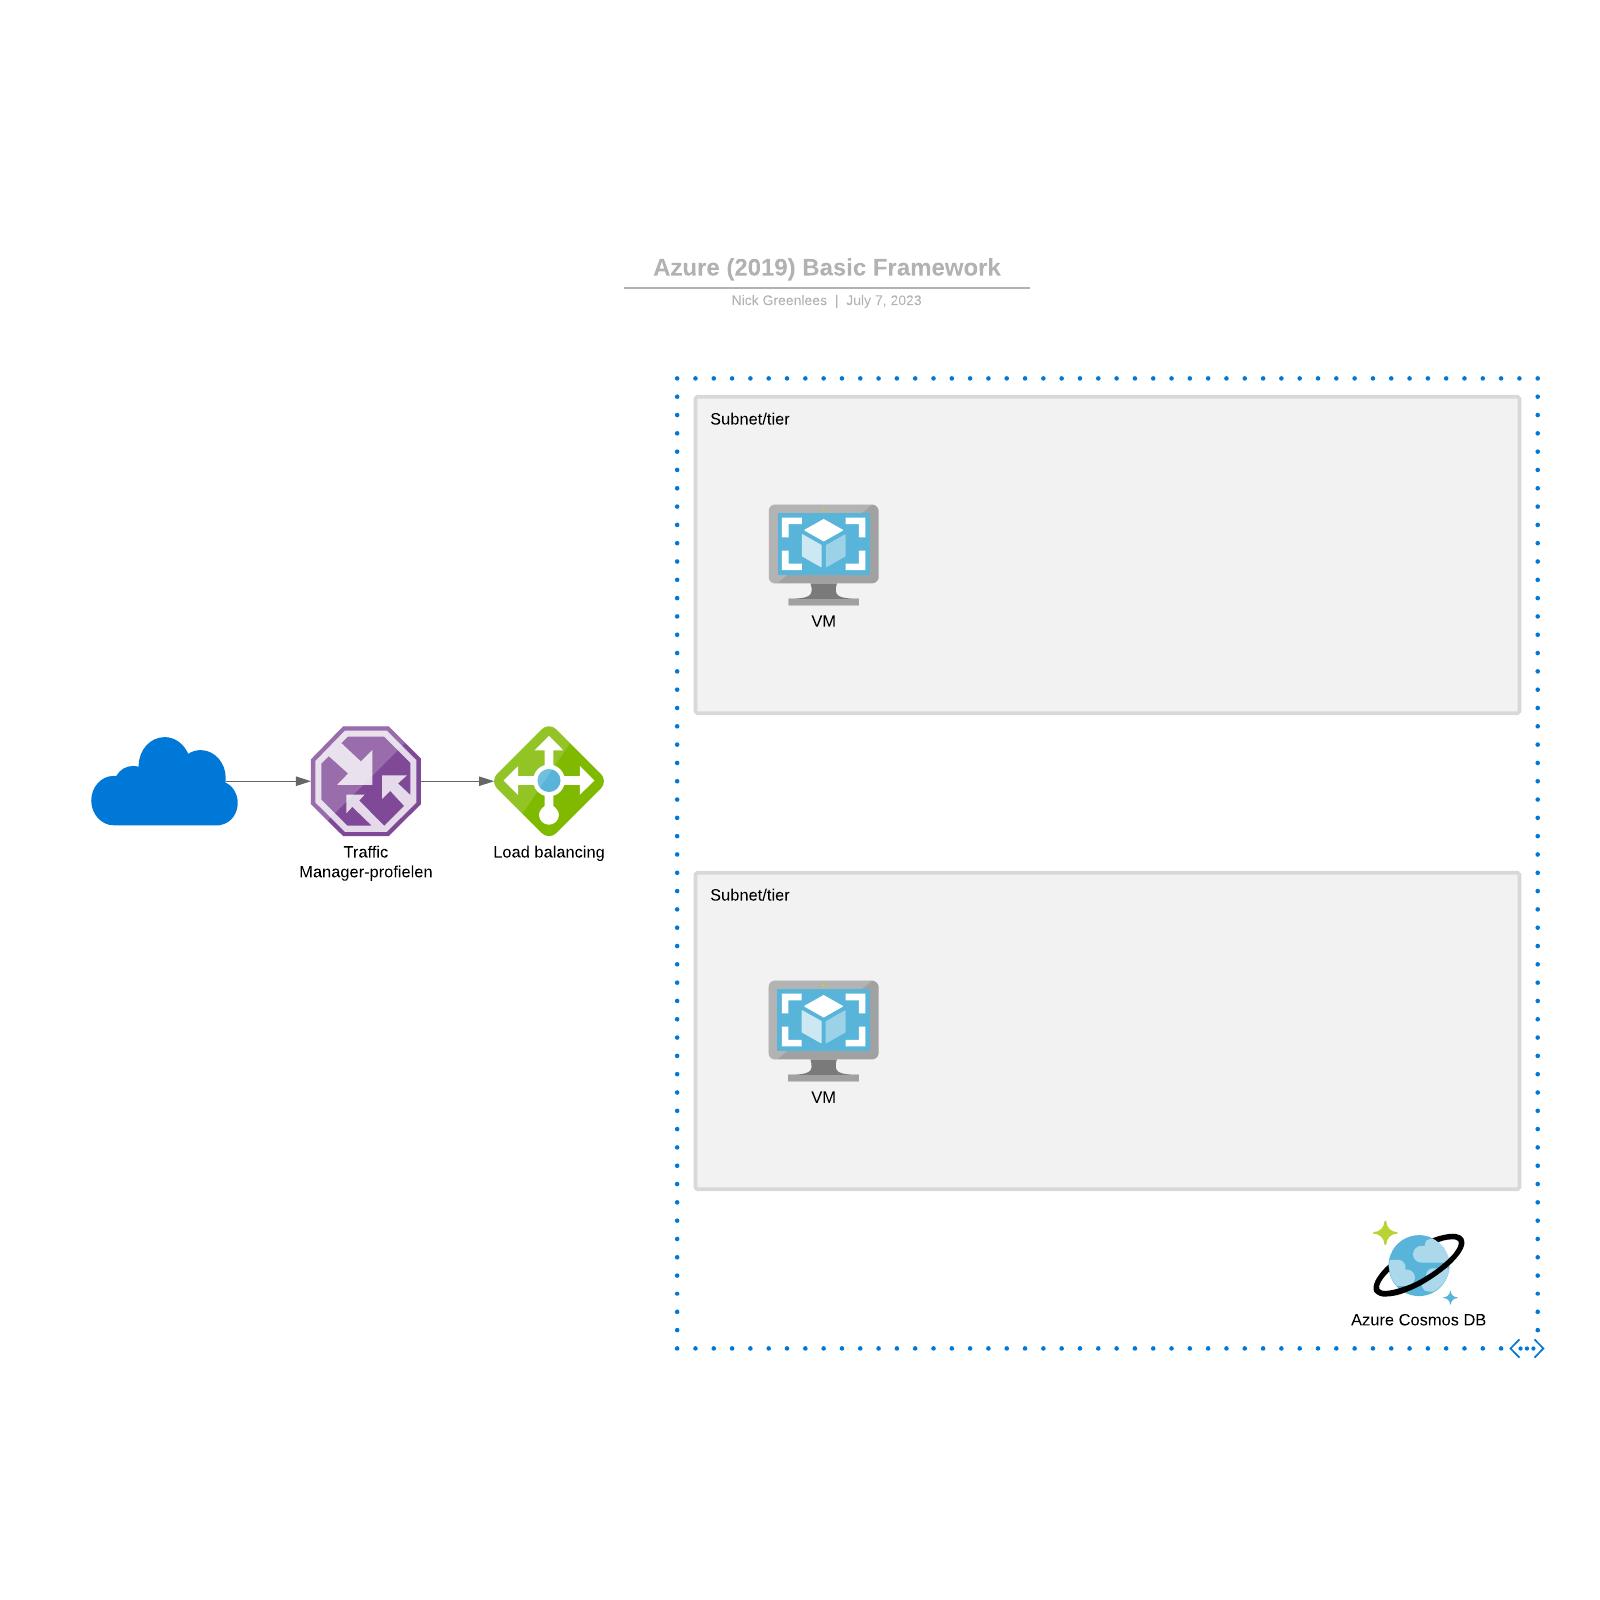 Azure (2019) Basic Framework